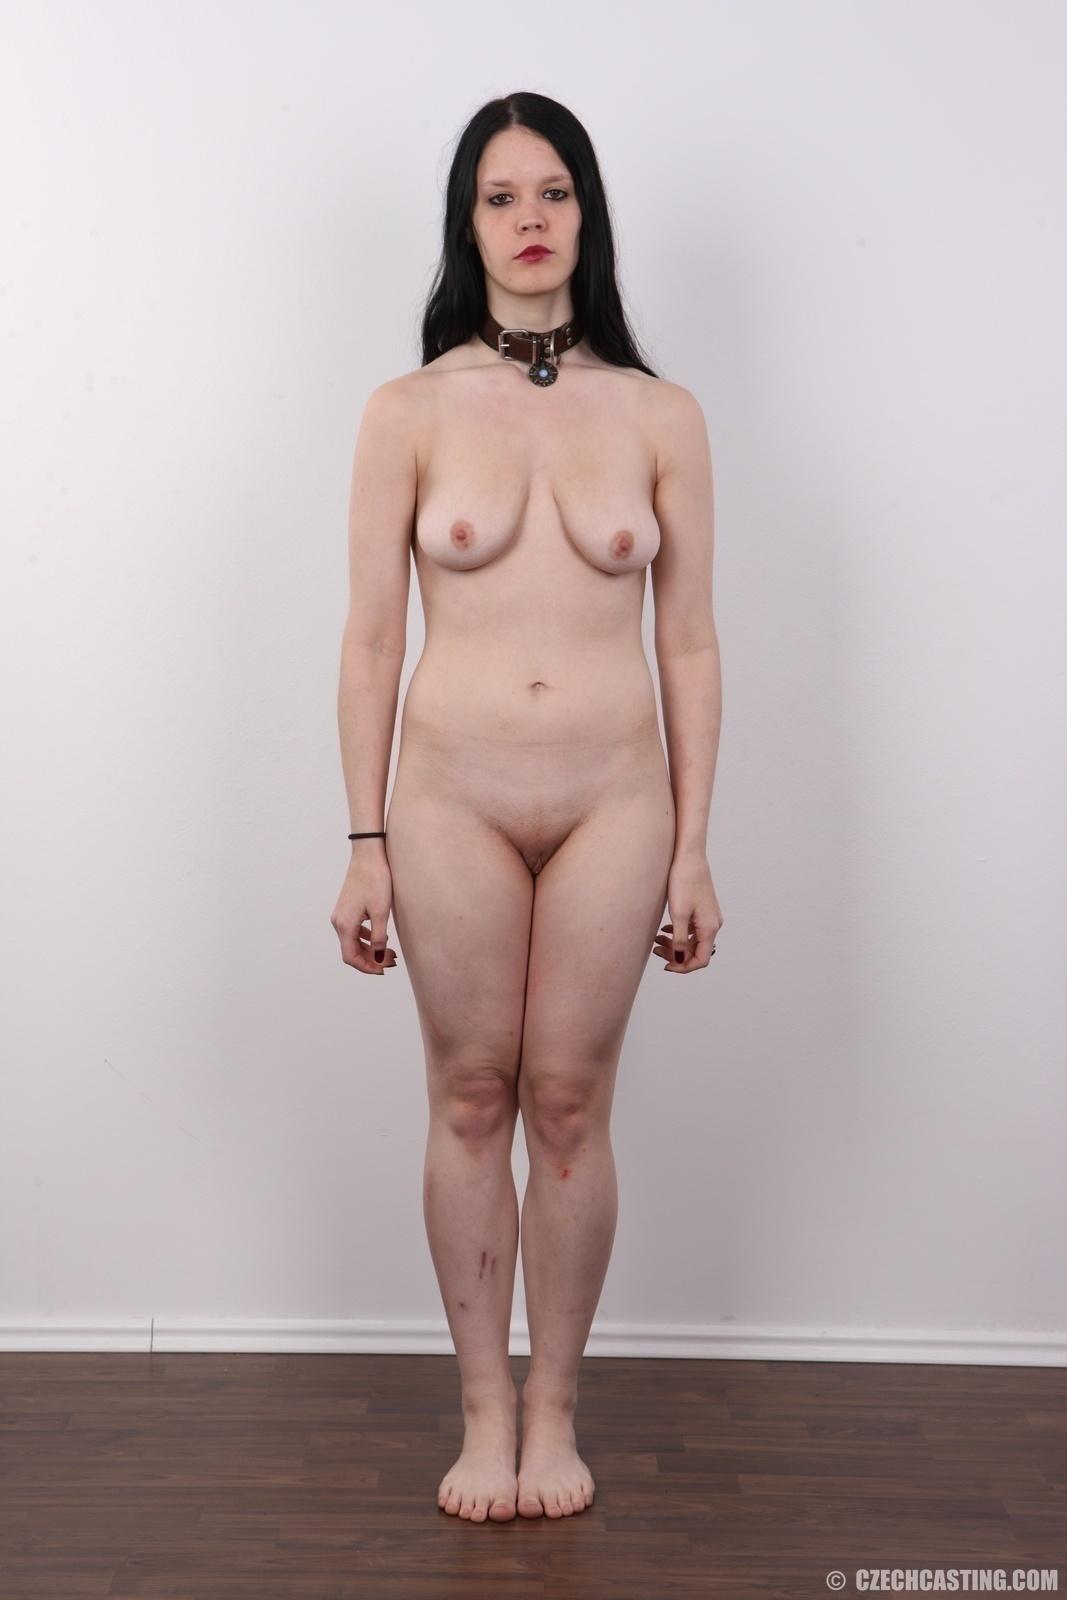 mobil dating czech model escort